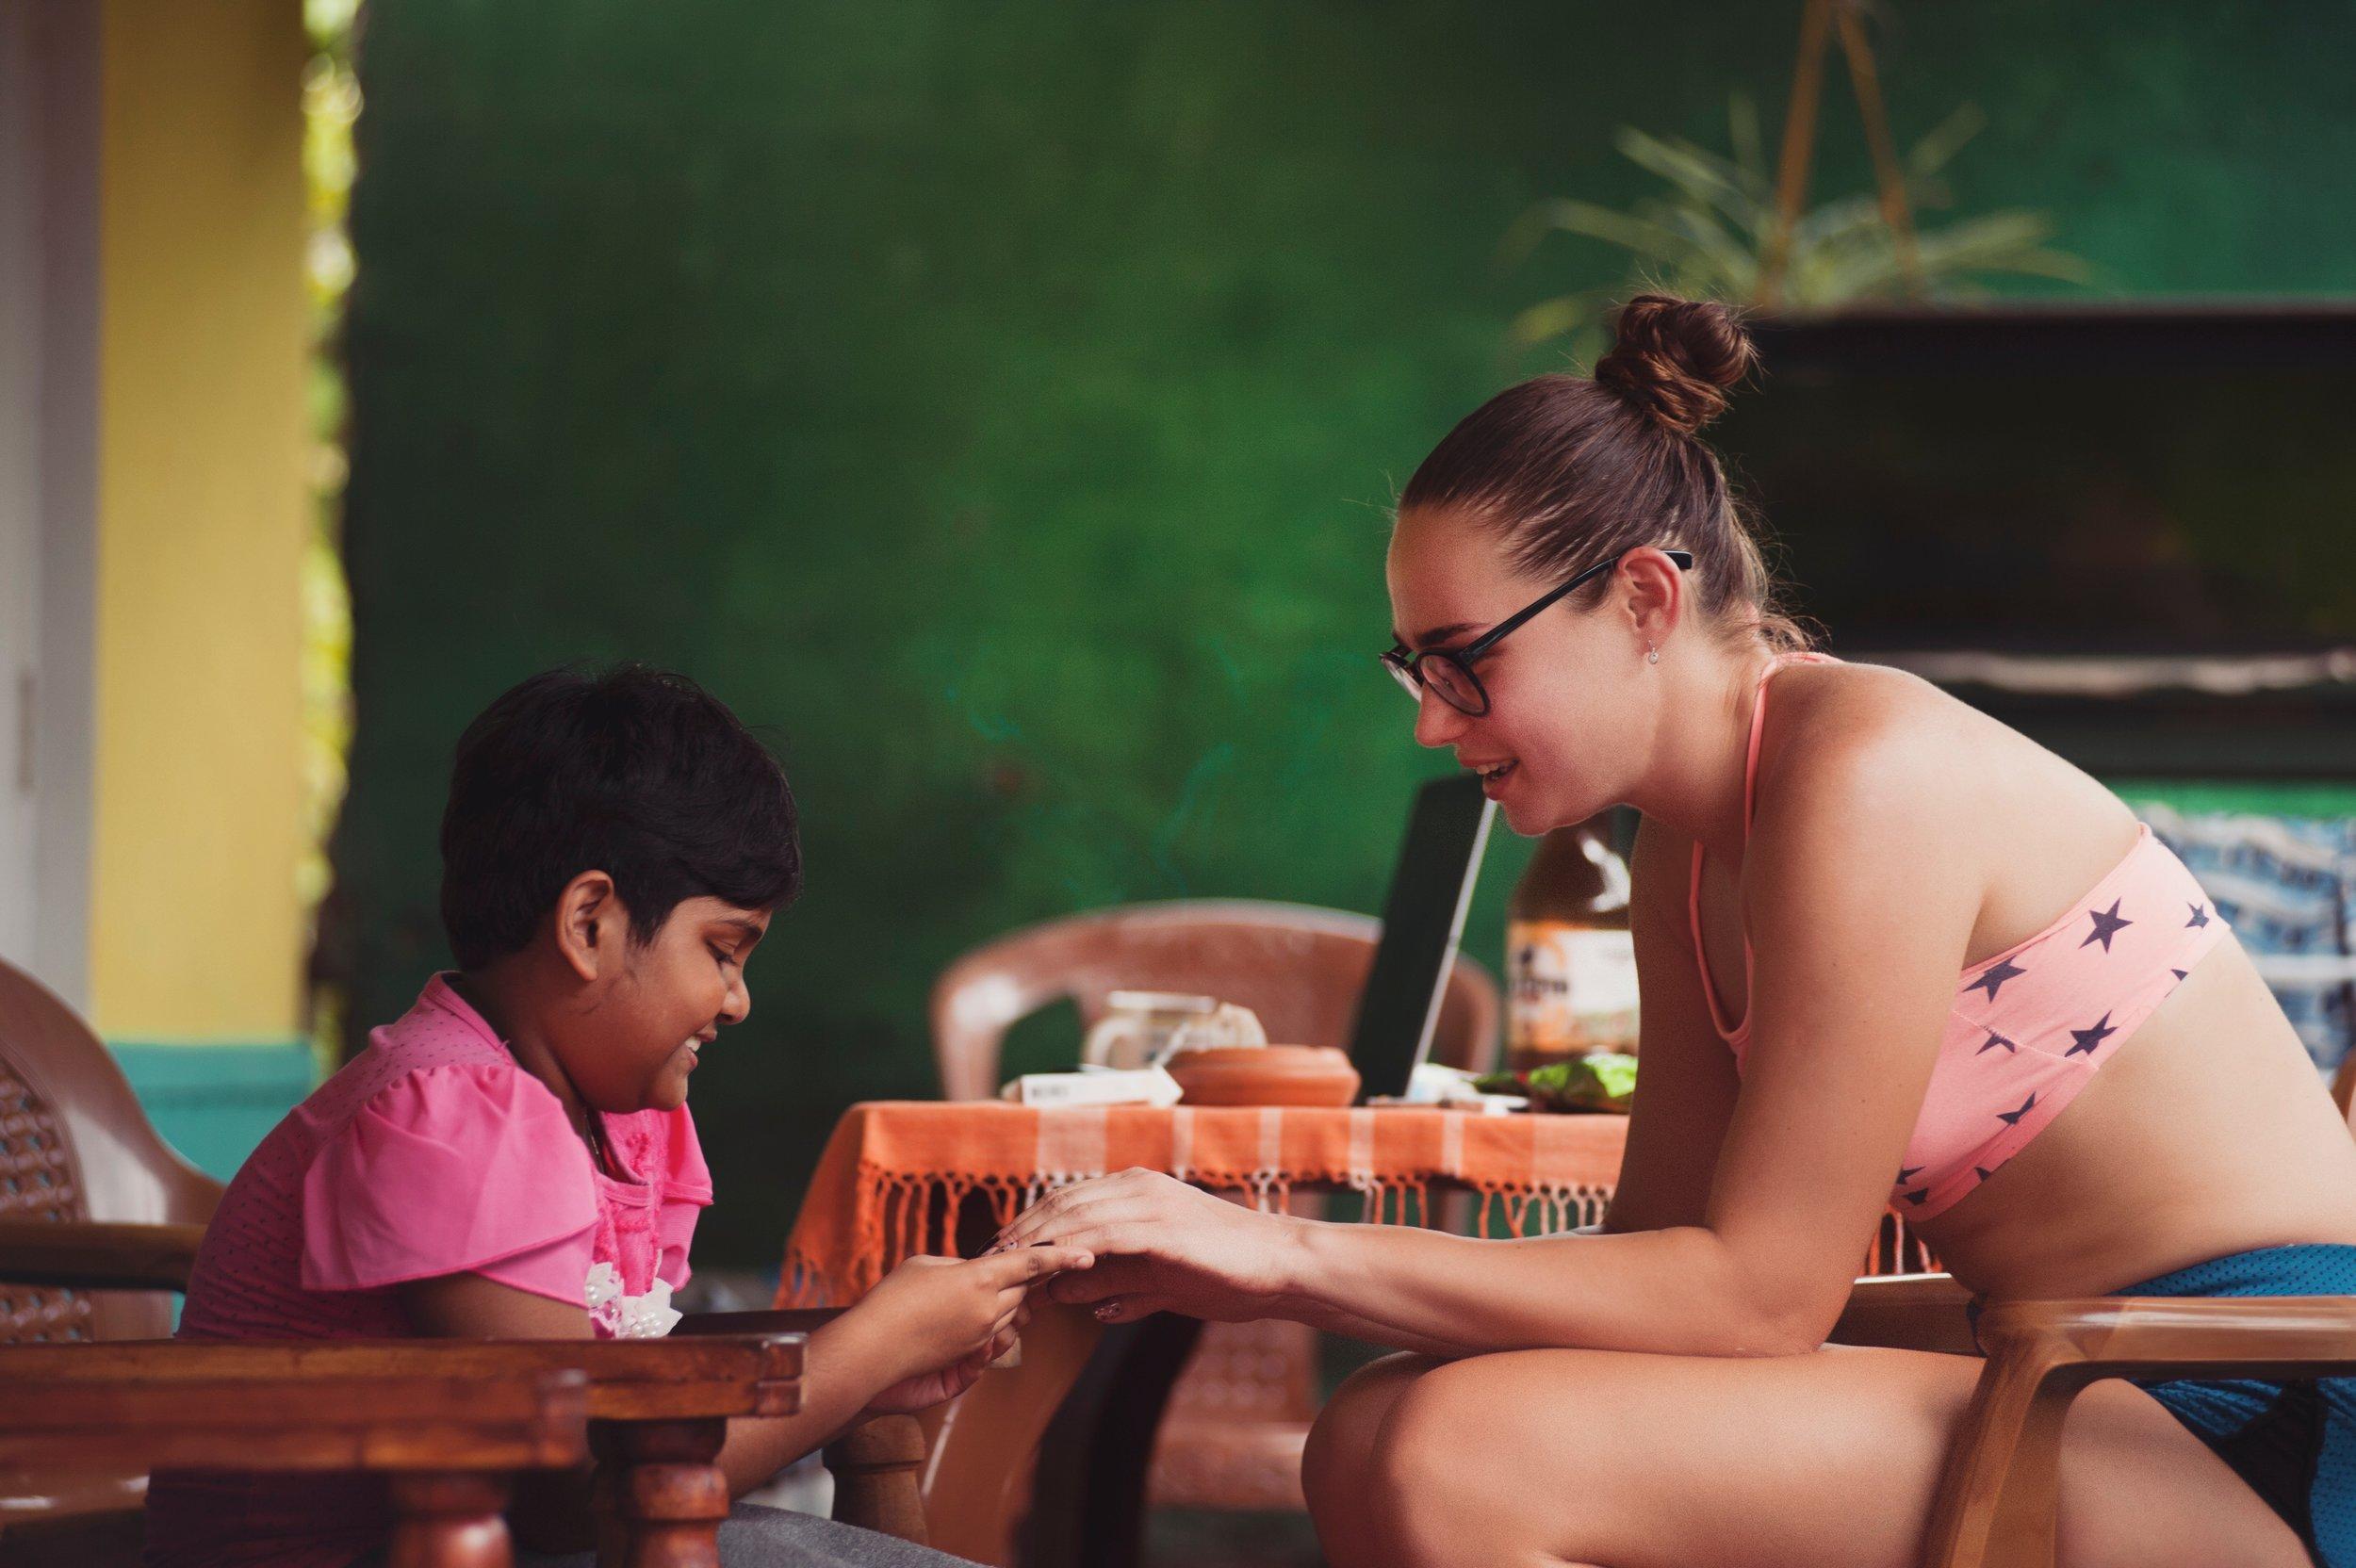 volunteer-working-with-child